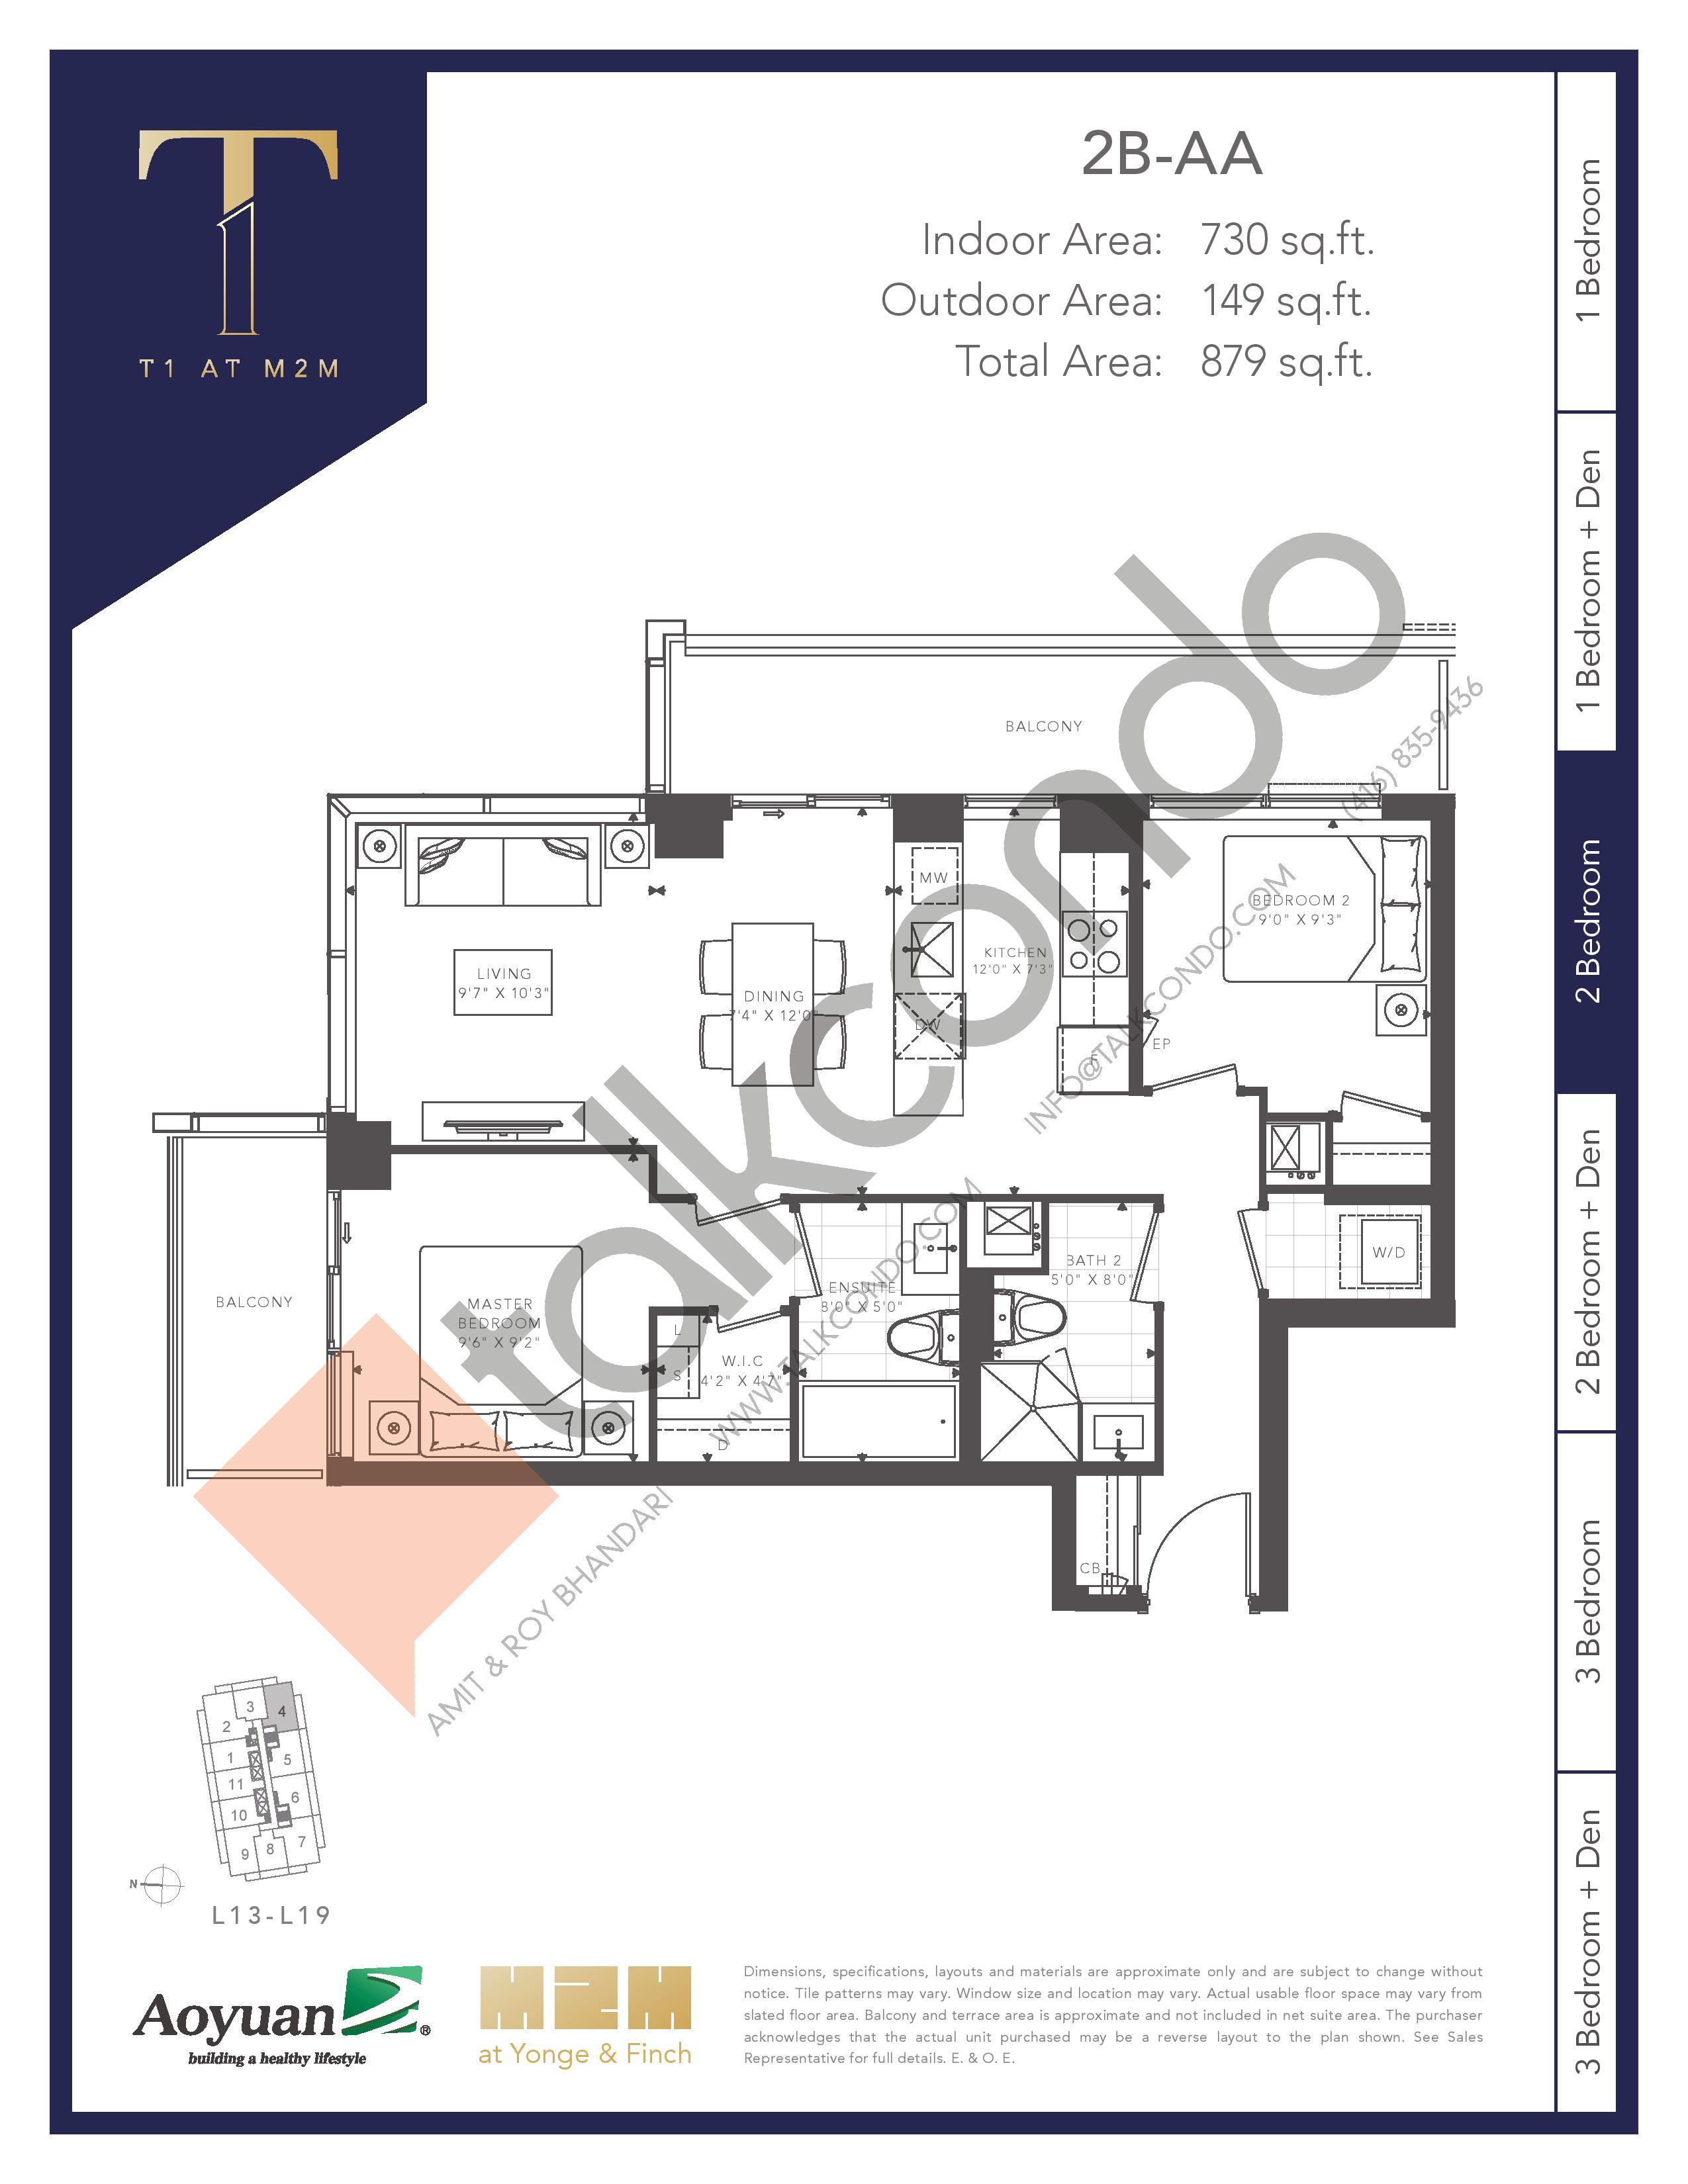 2B-AA (Tower) Floor Plan at T1 at M2M Condos - 730 sq.ft